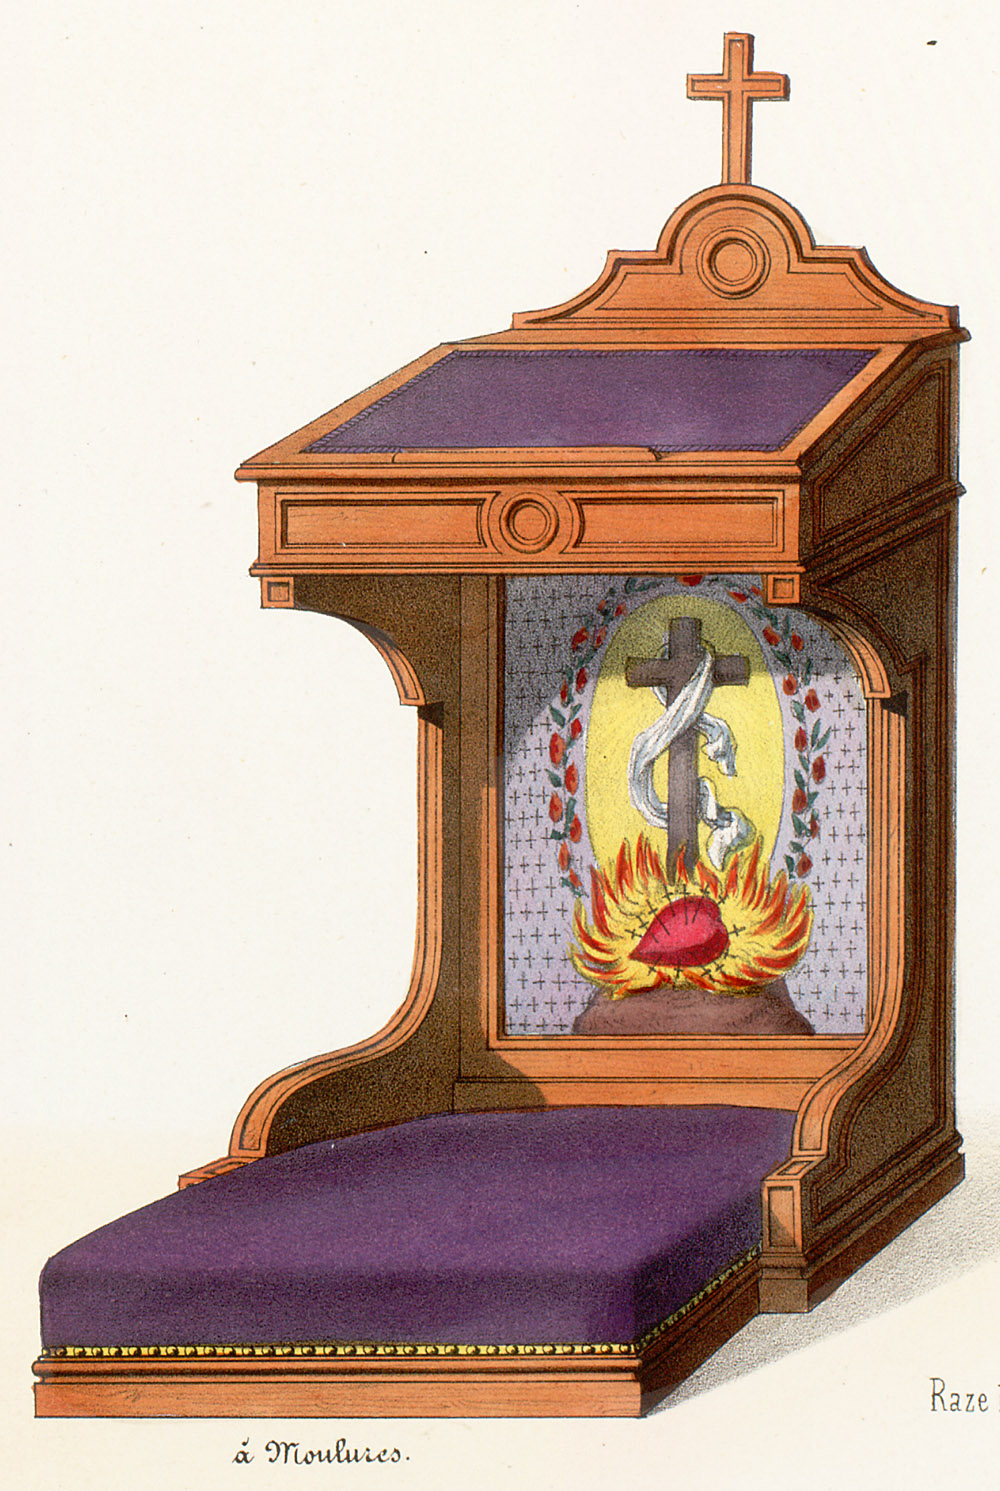 Le garde meuble for Le meuble villageois furniture